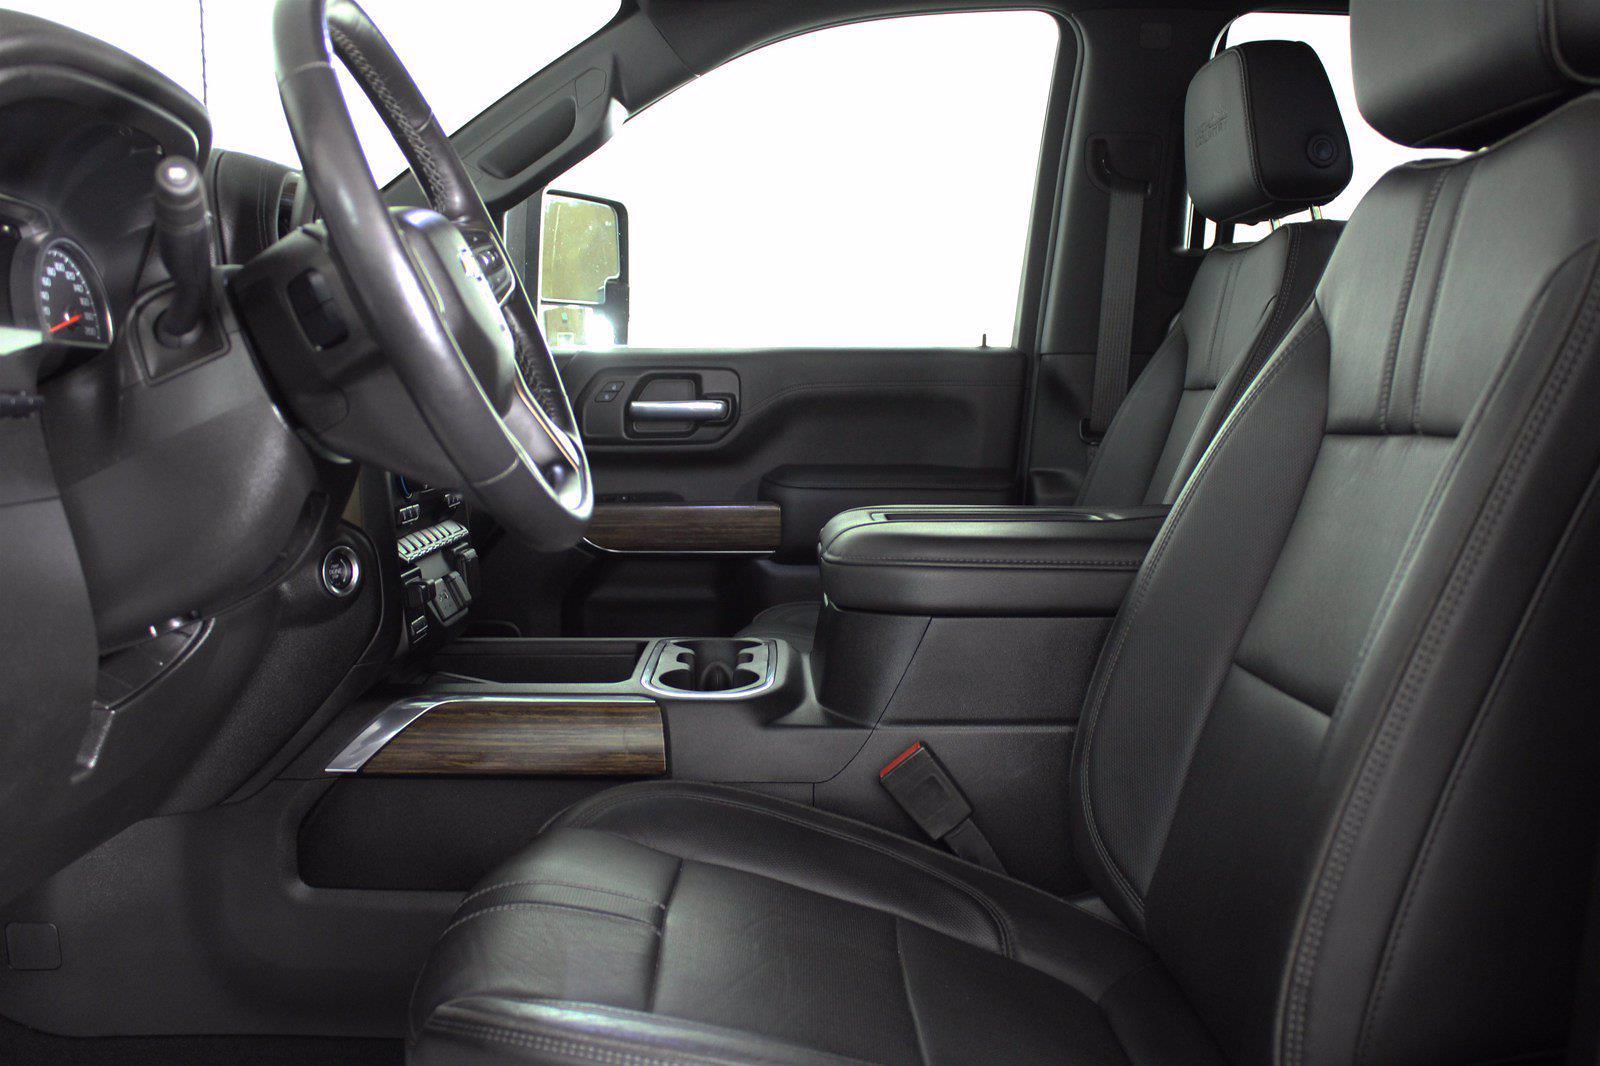 2020 Chevrolet Silverado 3500 Crew Cab 4x4, Pickup #DAZ0421 - photo 5